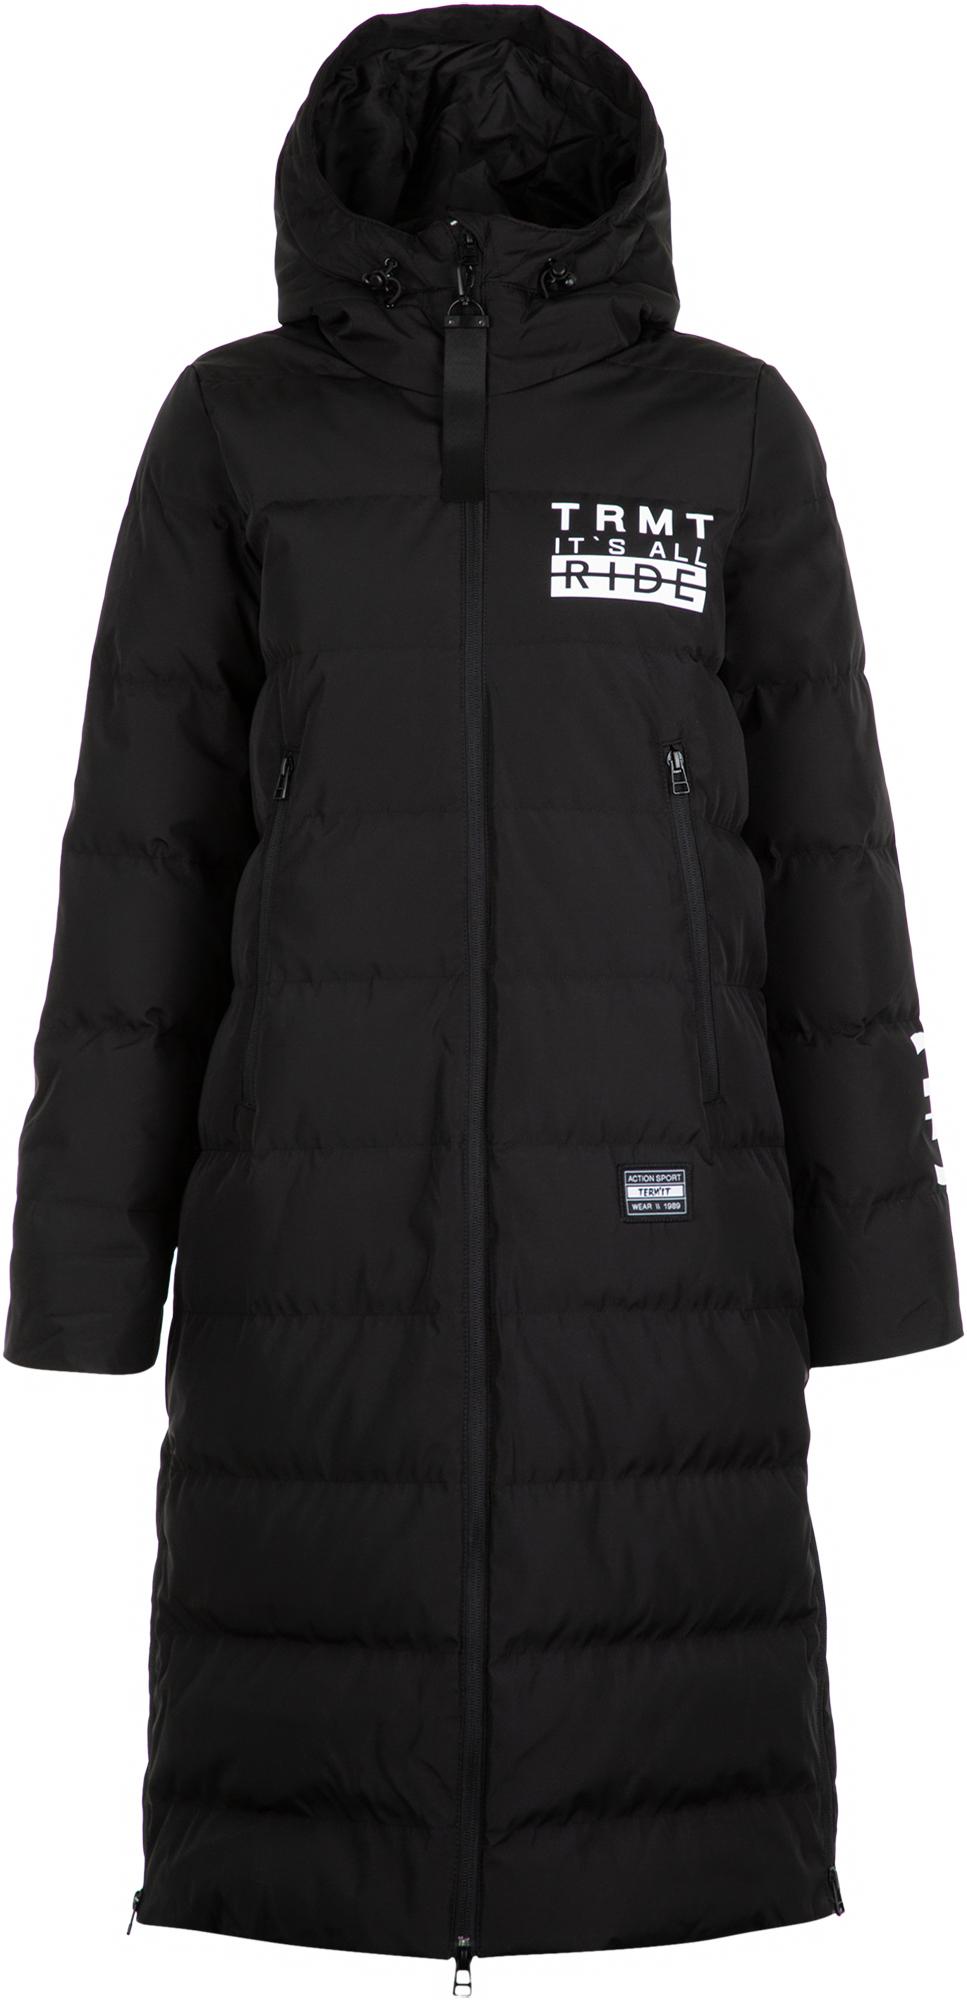 Termit Куртка пуховая женская Termit, размер 42